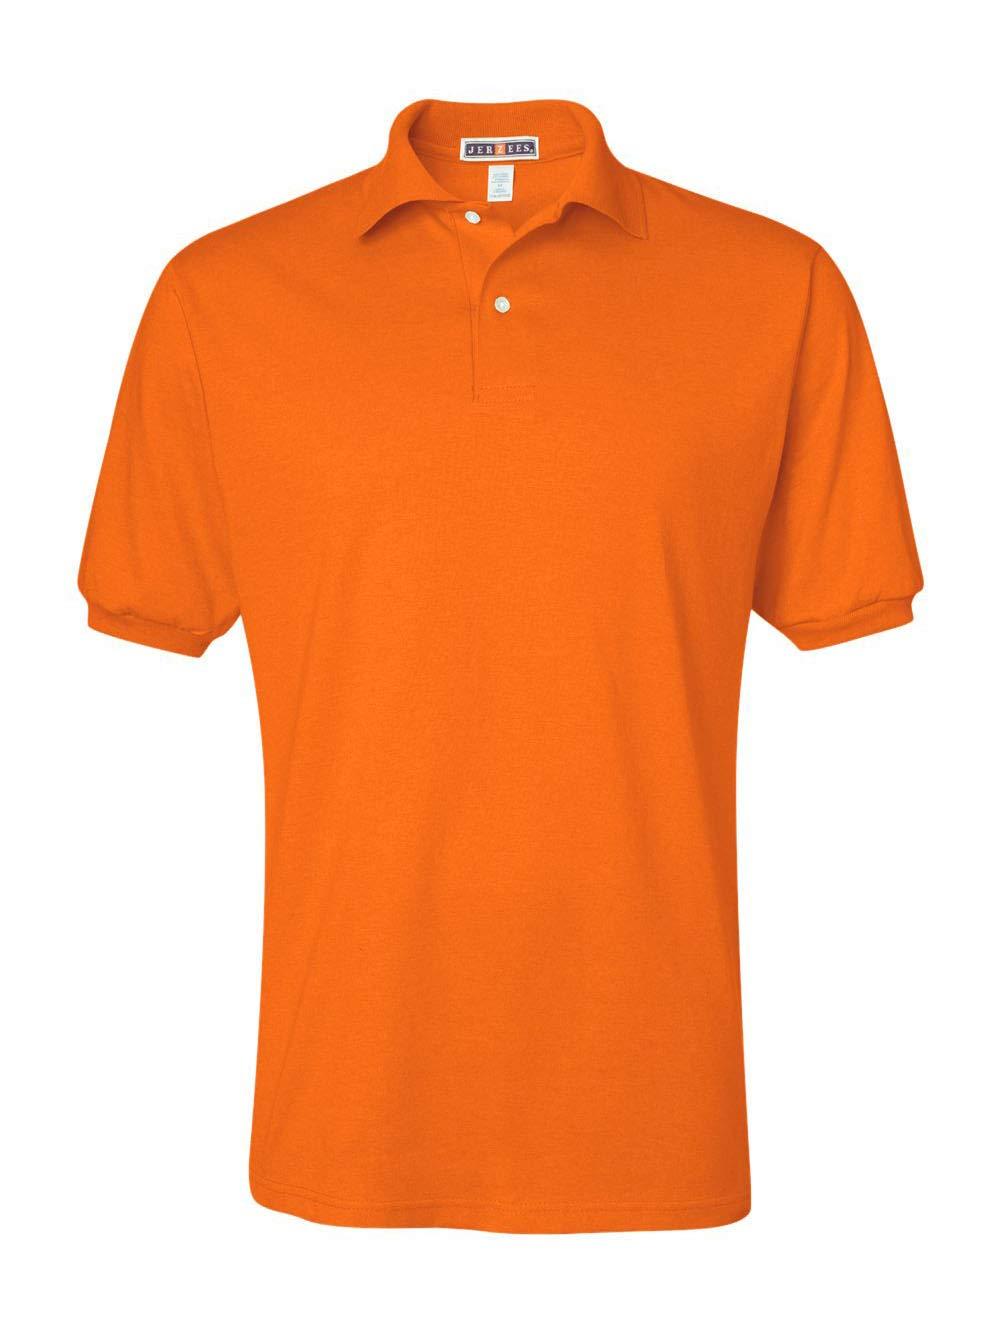 Jerzees Men's Spot Shield Short Sleeve Polo Sport Shirt, Safety Orange, 2X-Large